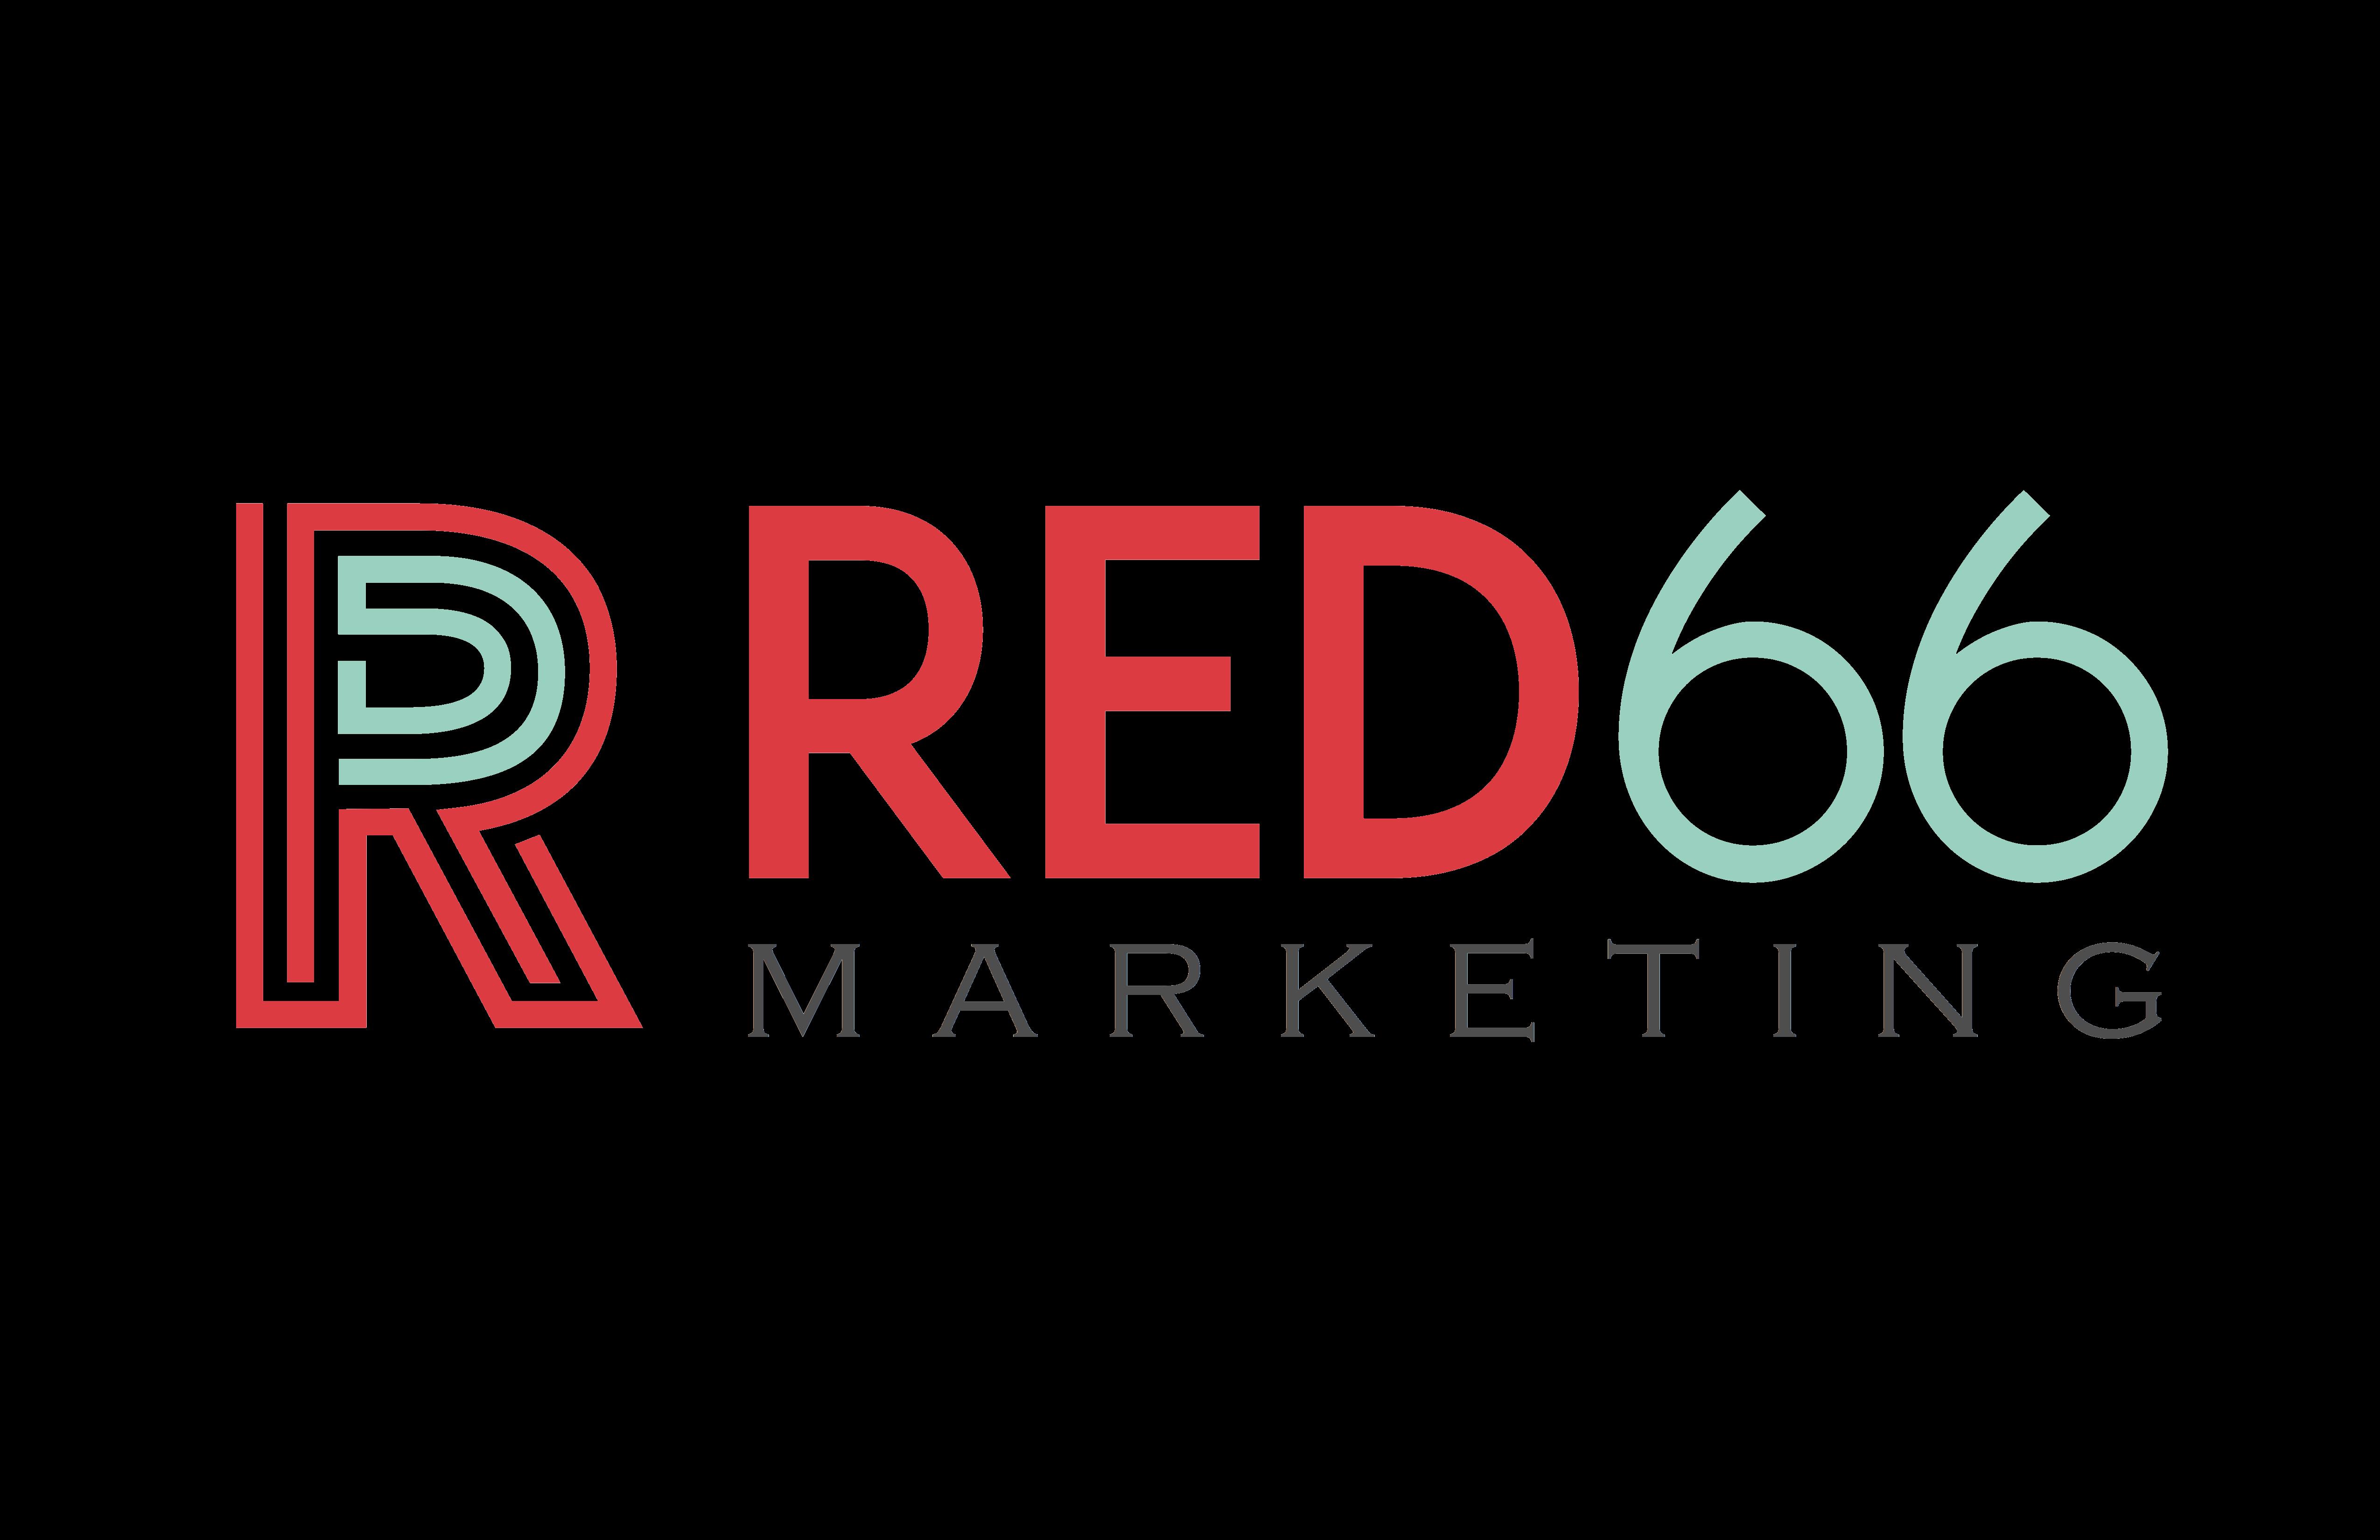 RED66 Marketing Logo Transparent